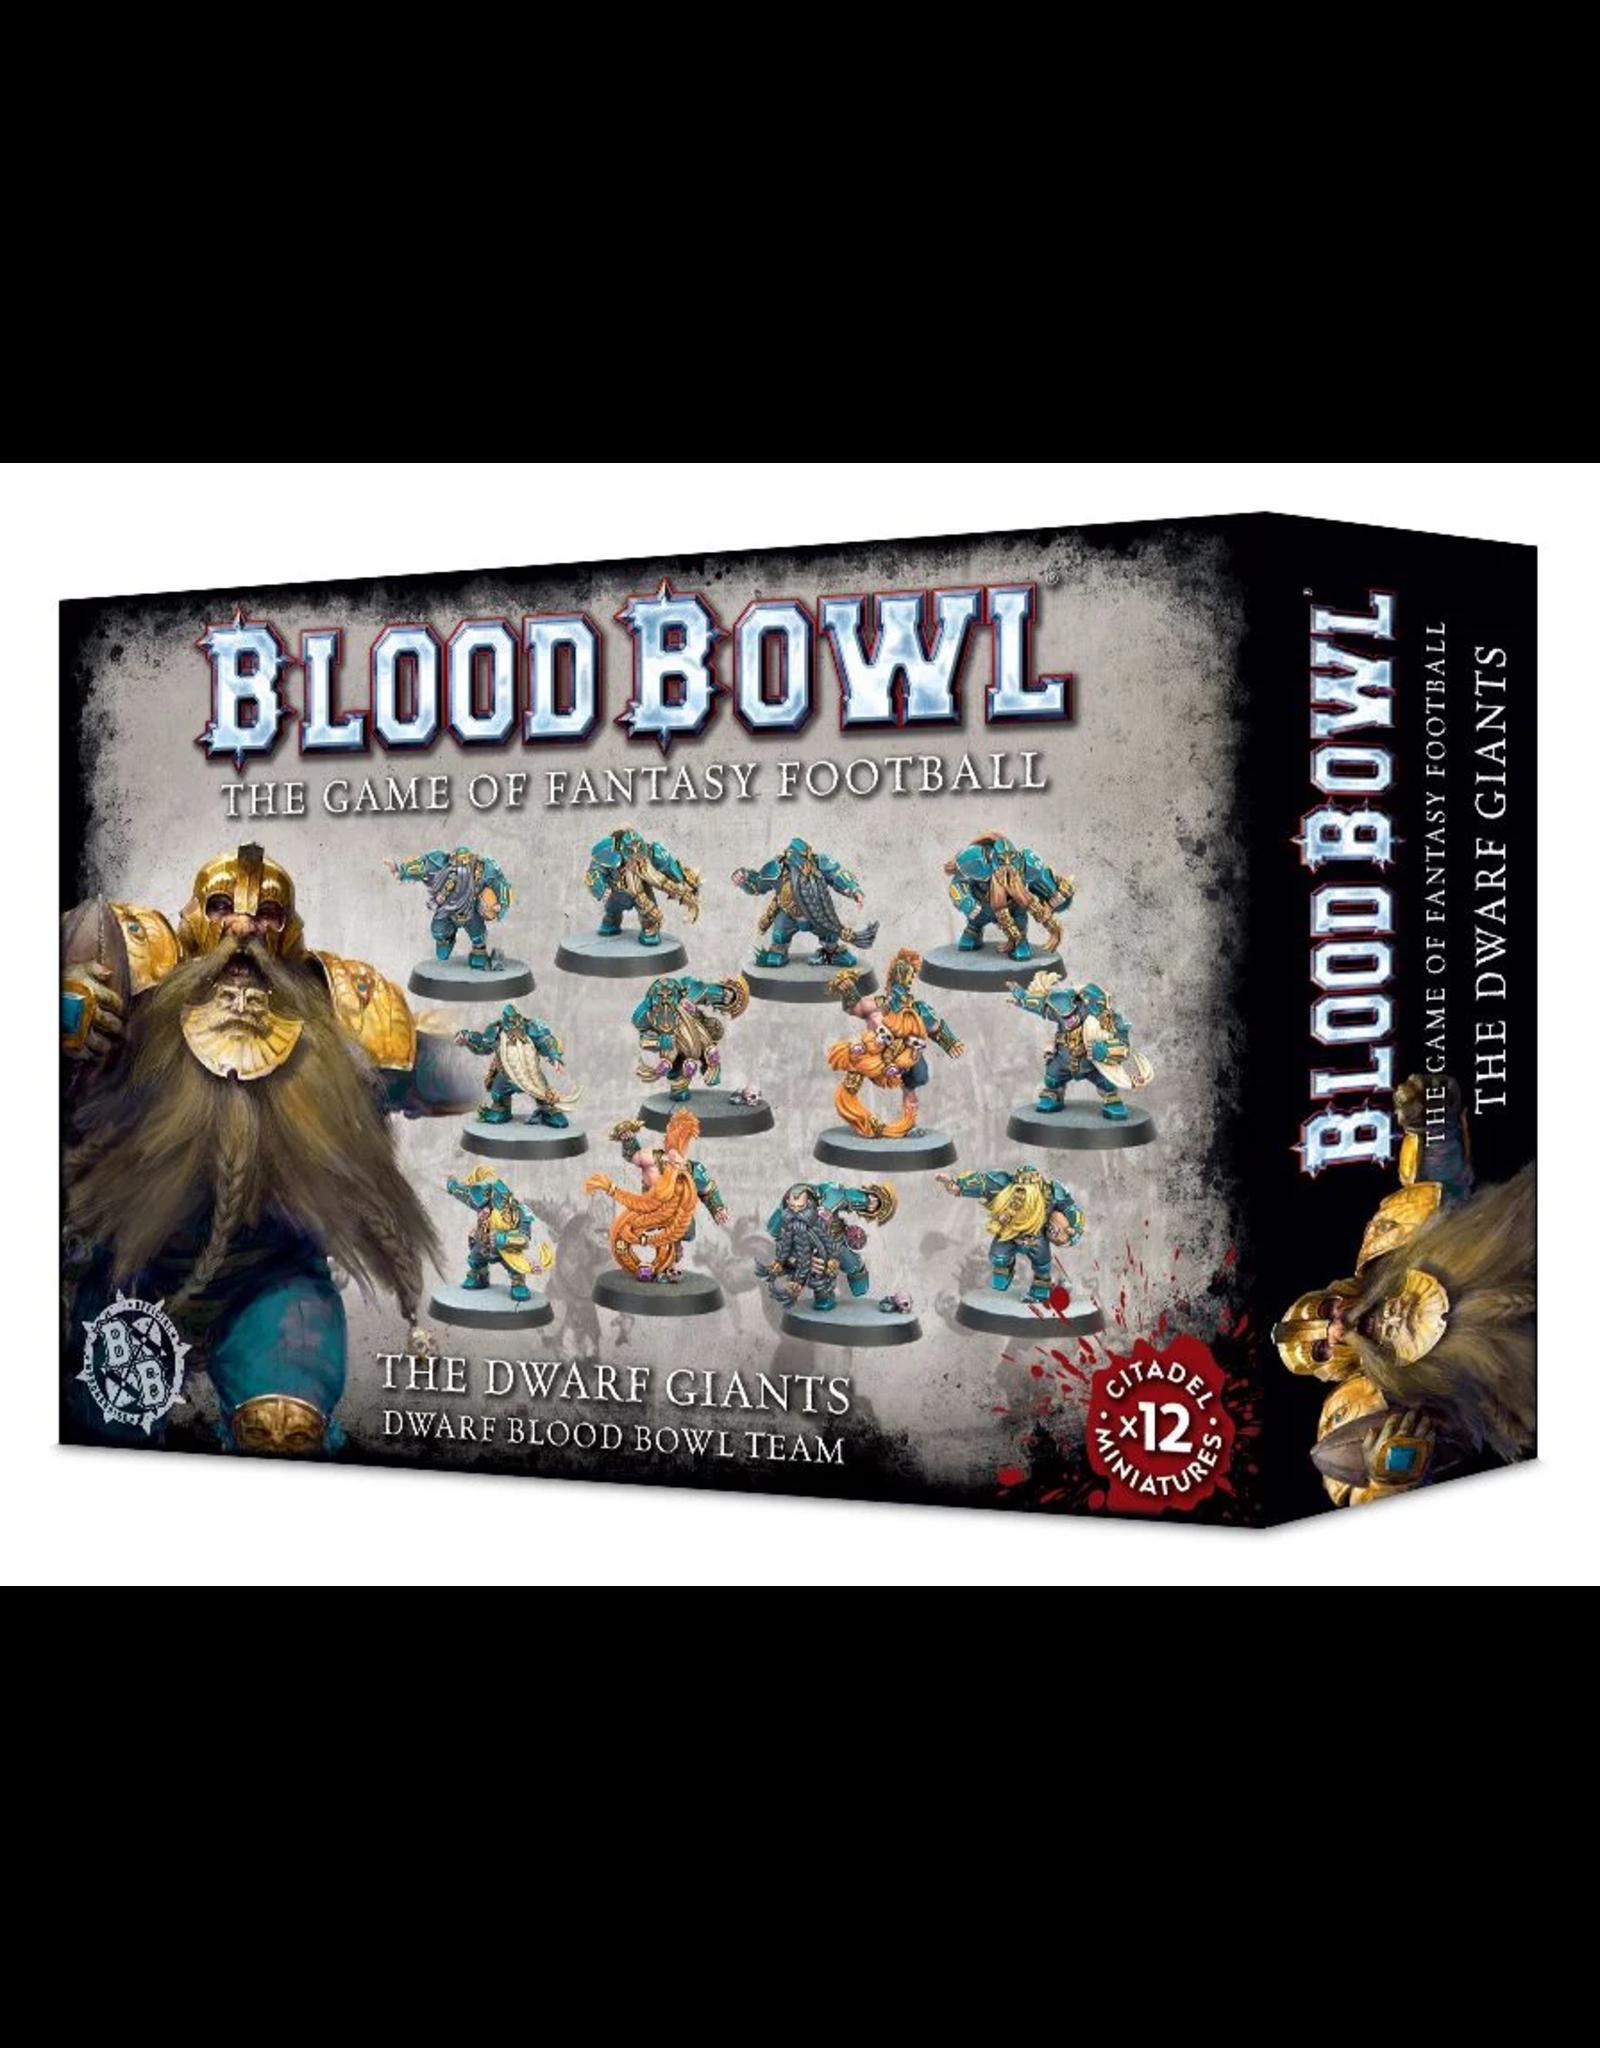 Warhammer Blood Bowl Team - Dwarf Giants